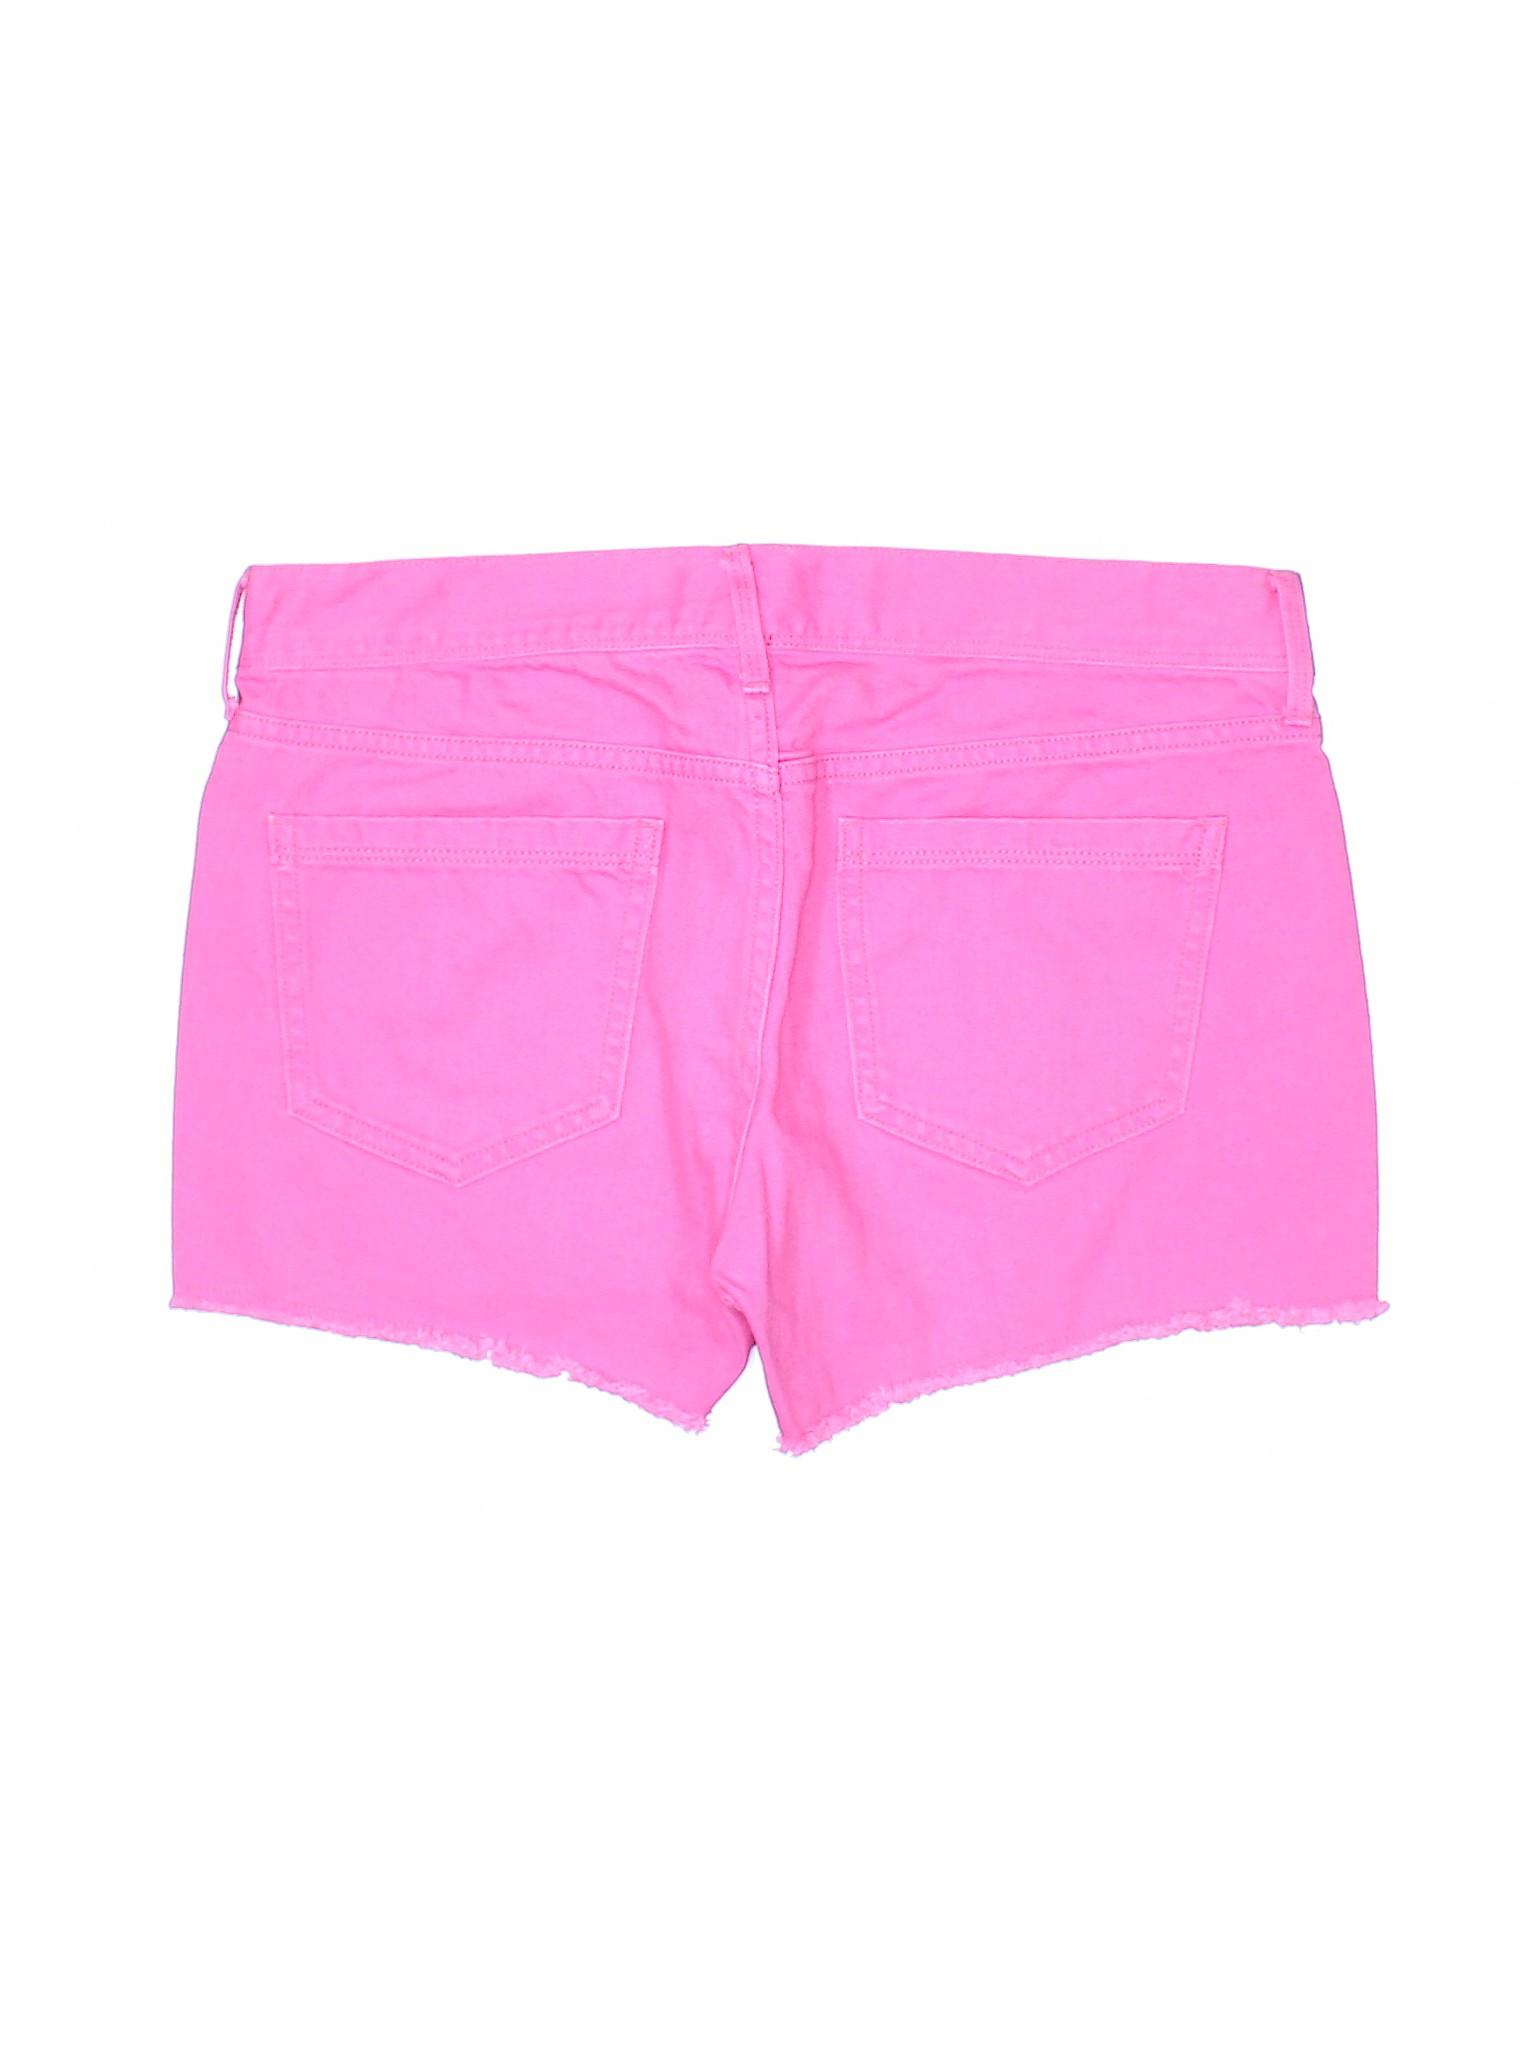 Boutique leisure Navy Denim Shorts Old qYAwq4